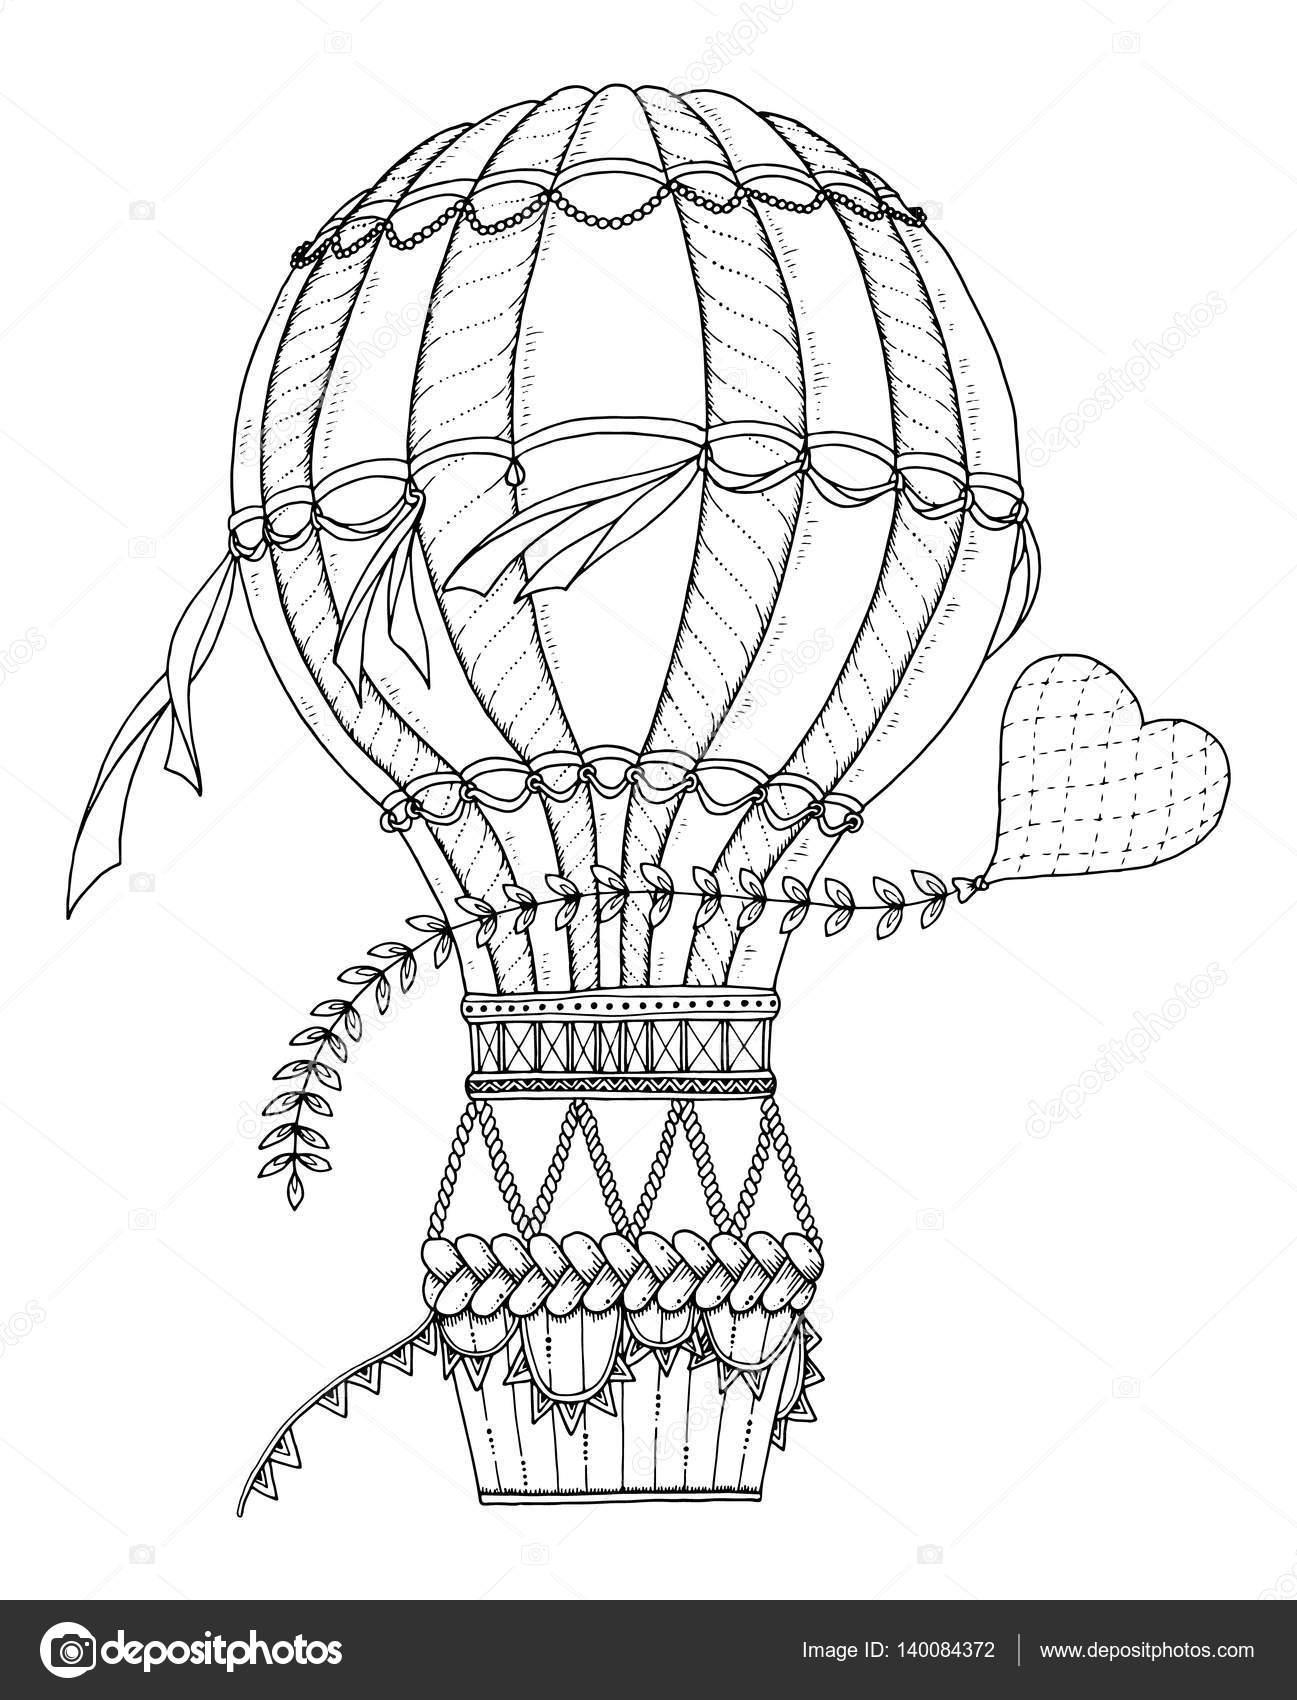 gratis kleurplaat luchtballon kidkleurplaat nl